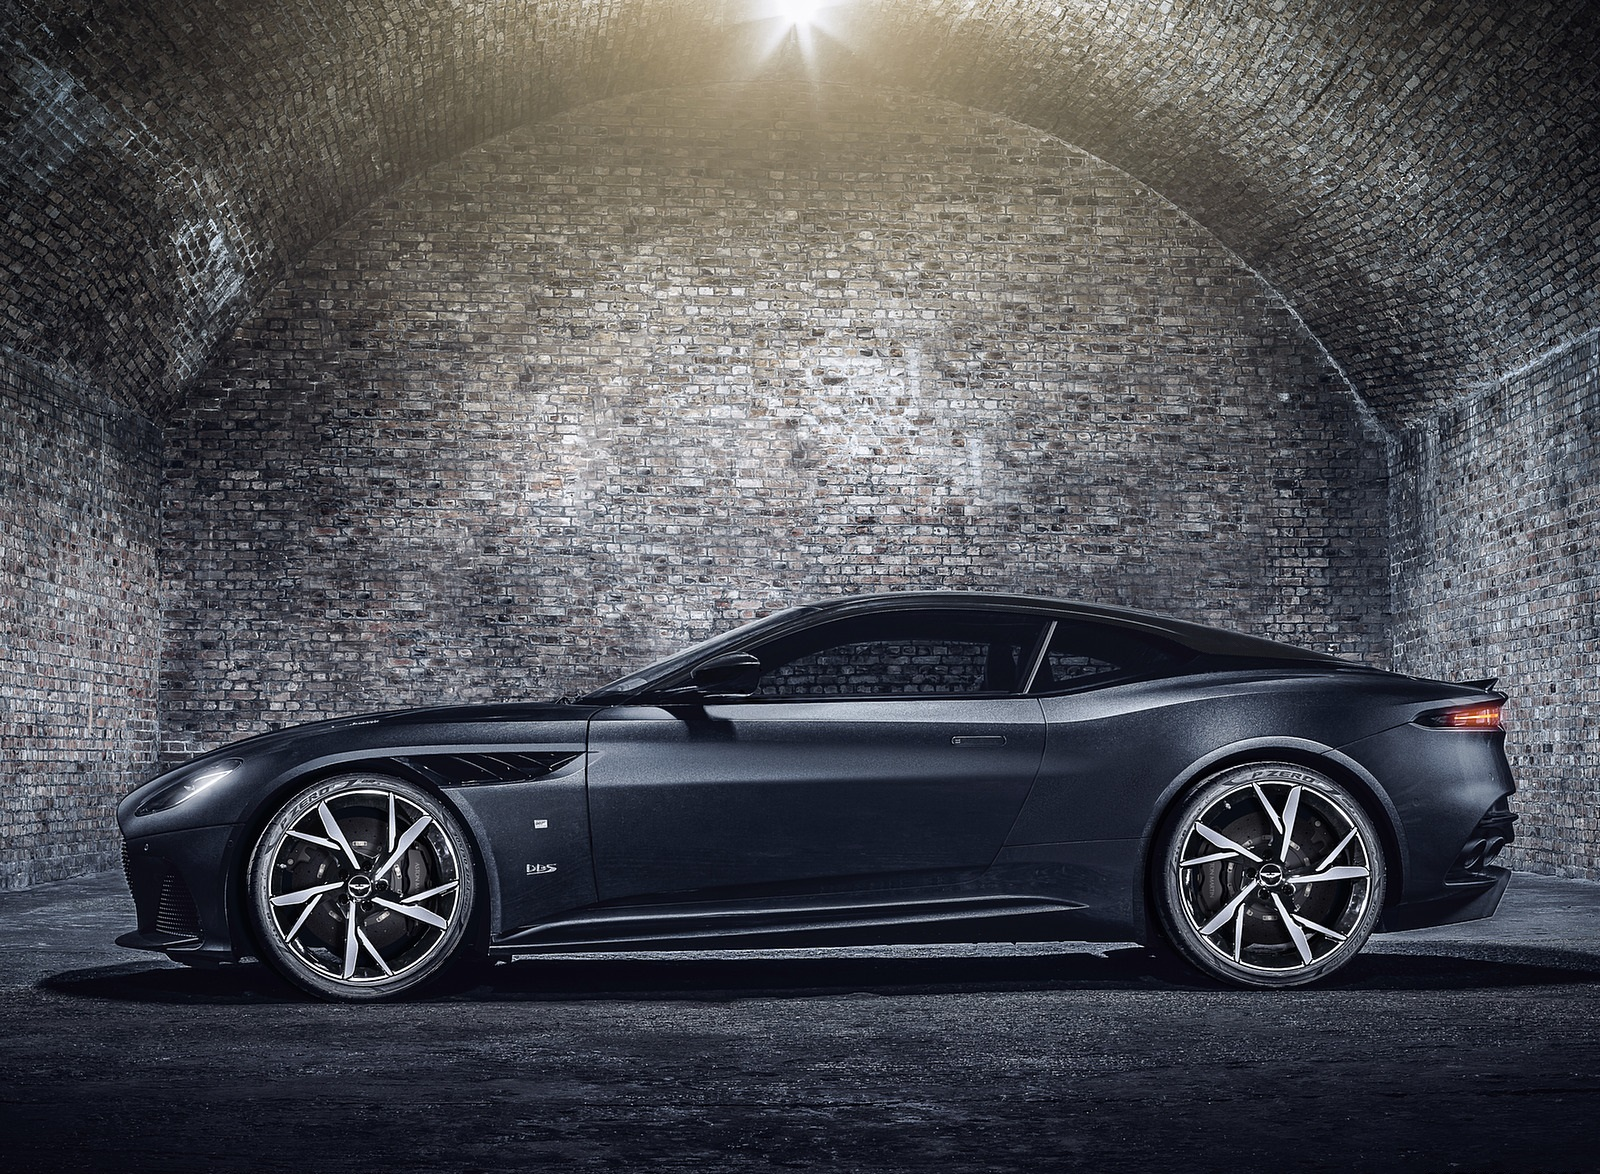 2021 Aston Martin DBS Superleggera 007 Edition Side Wallpapers (5)